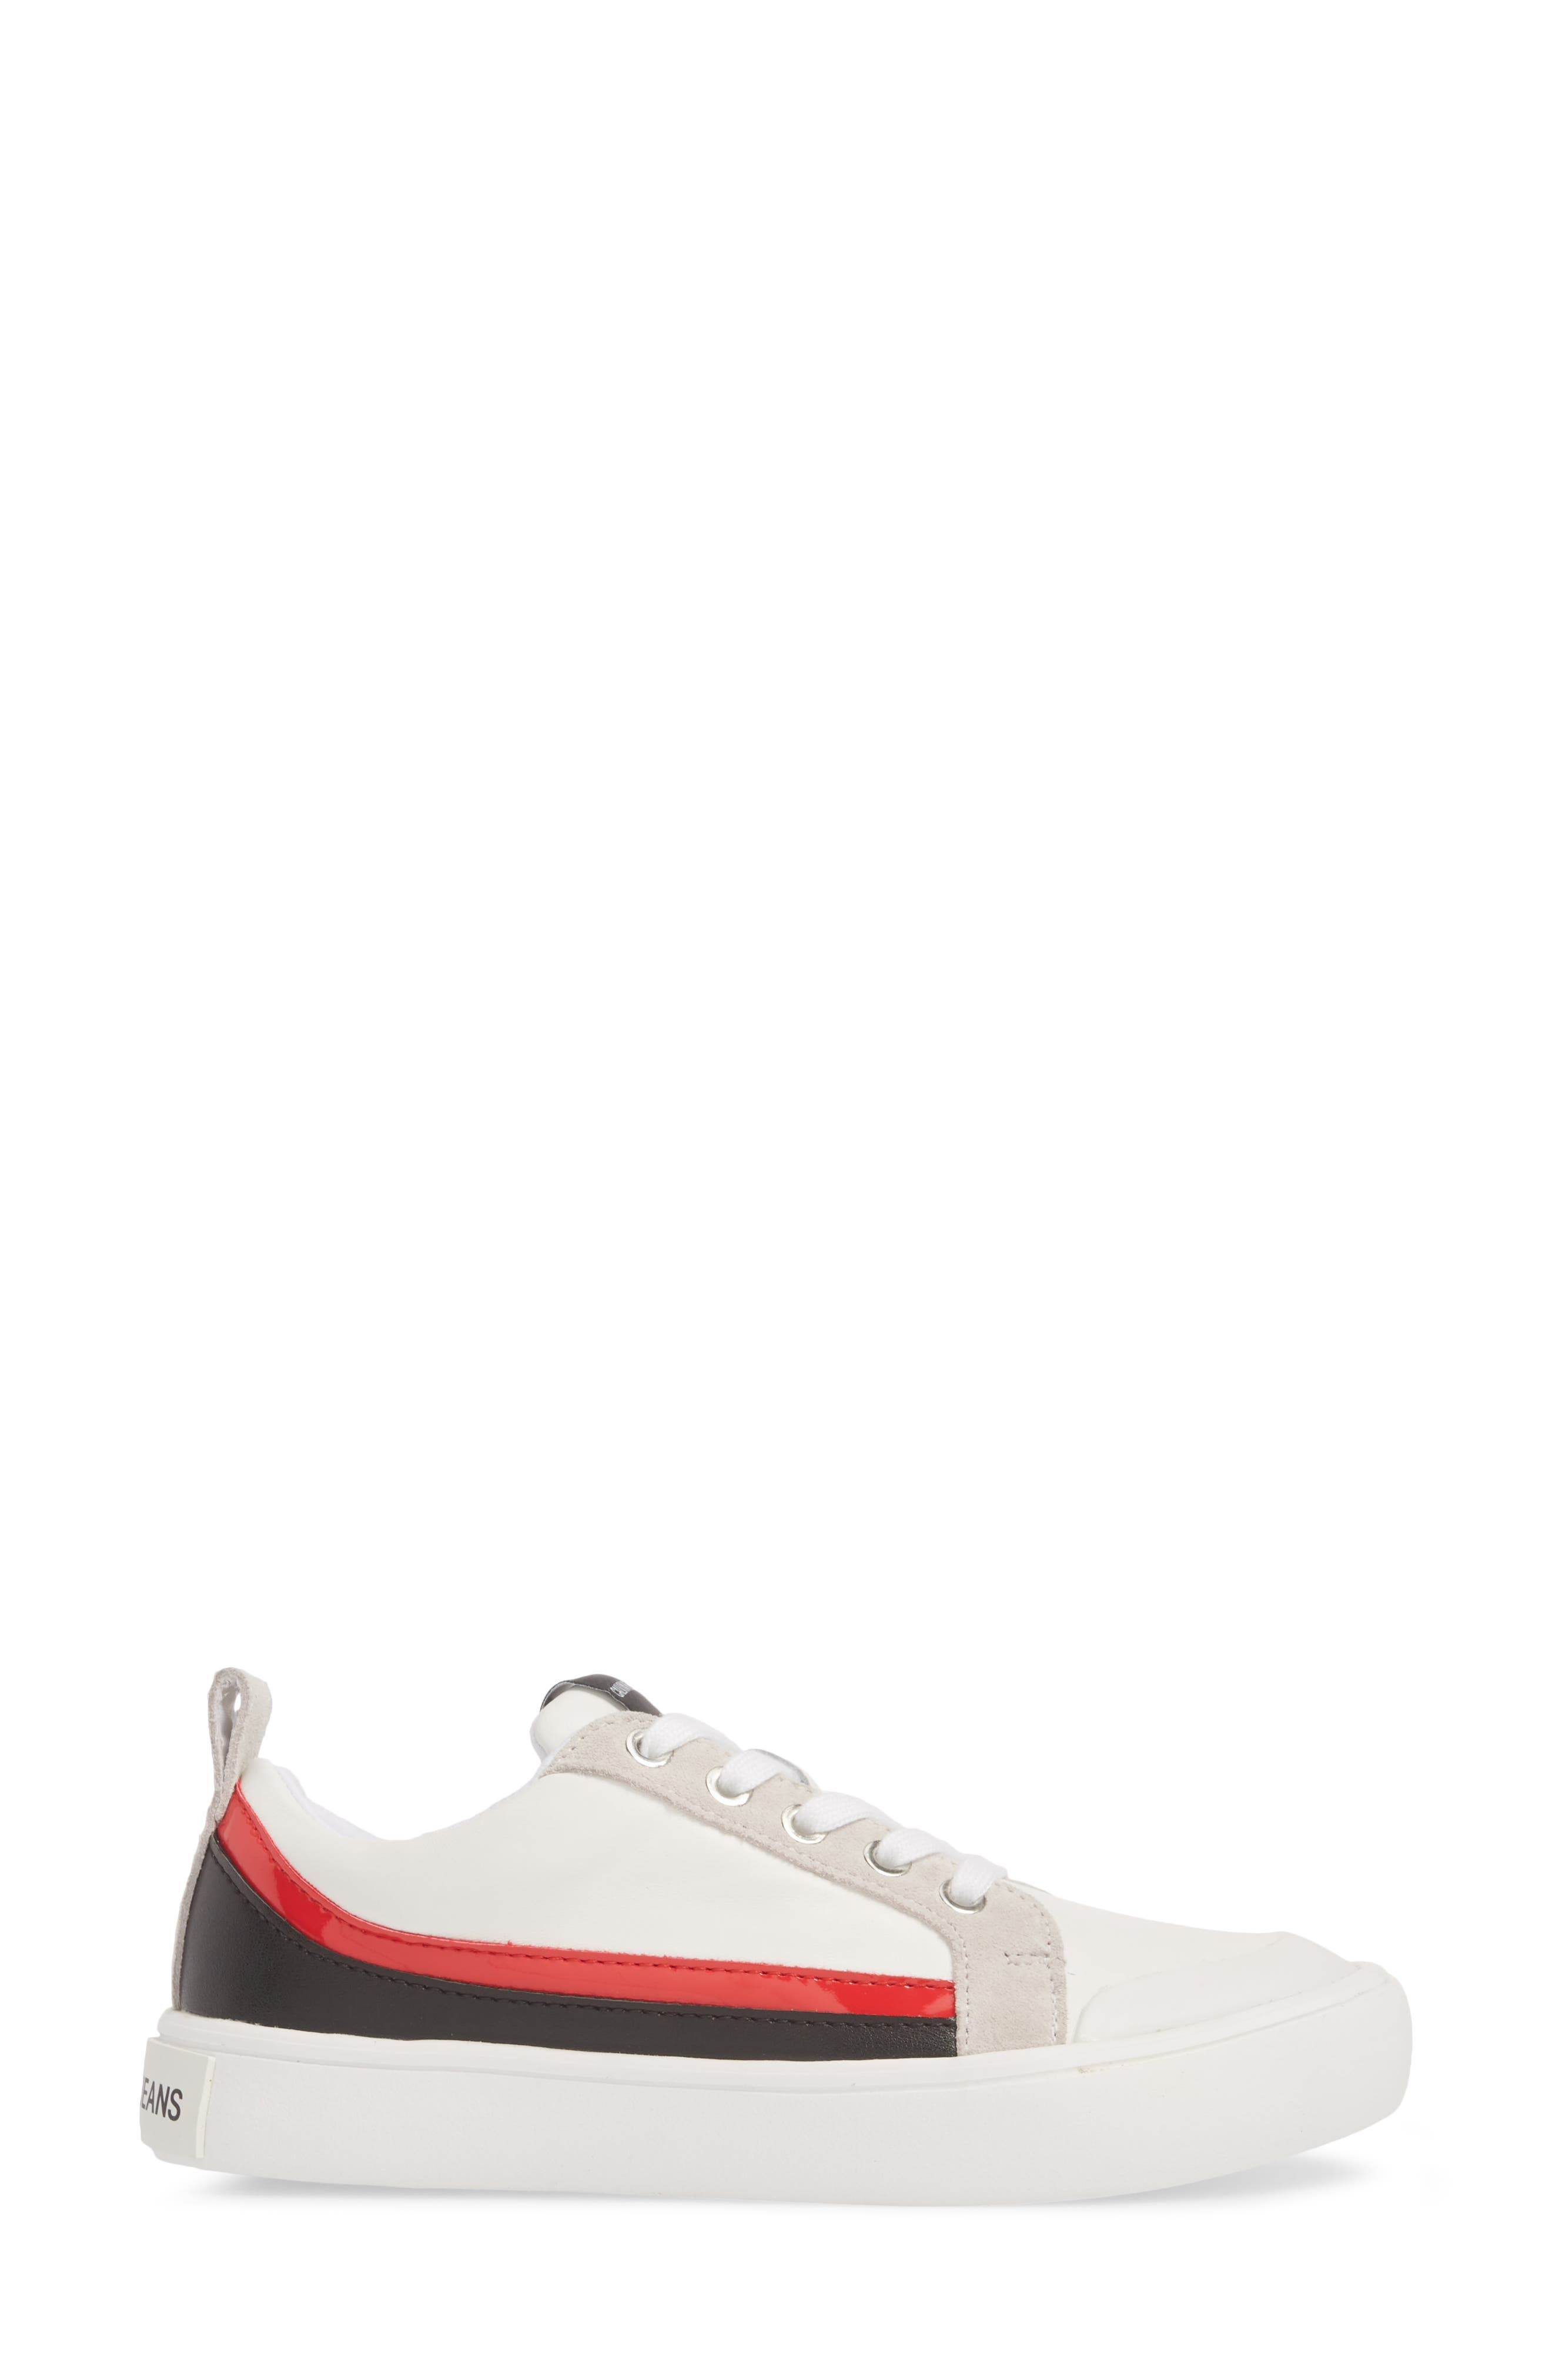 Dodie Sneaker,                             Alternate thumbnail 3, color,                             WHITE/ BLACK/ TOMATO